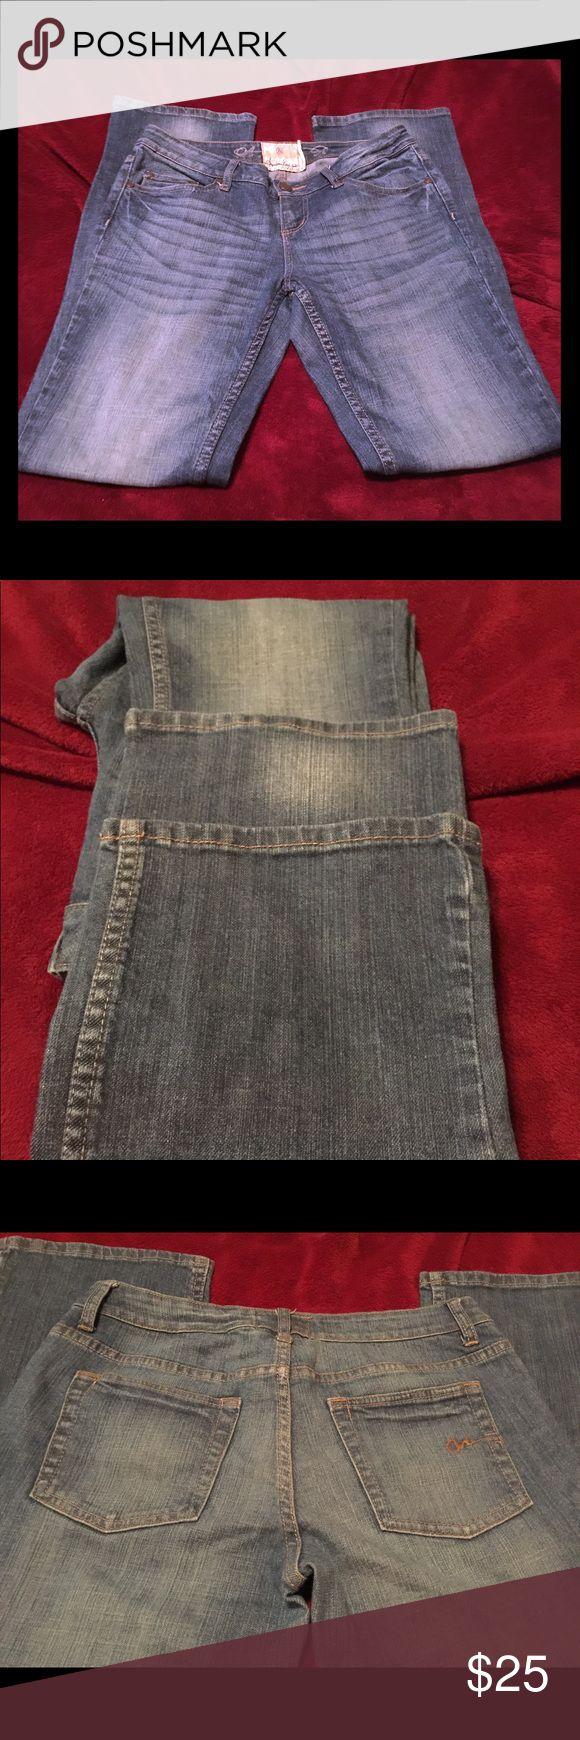 American Rag Jeans juniors American Rag size 7R.  5 pocket jeans. American Rag Jeans